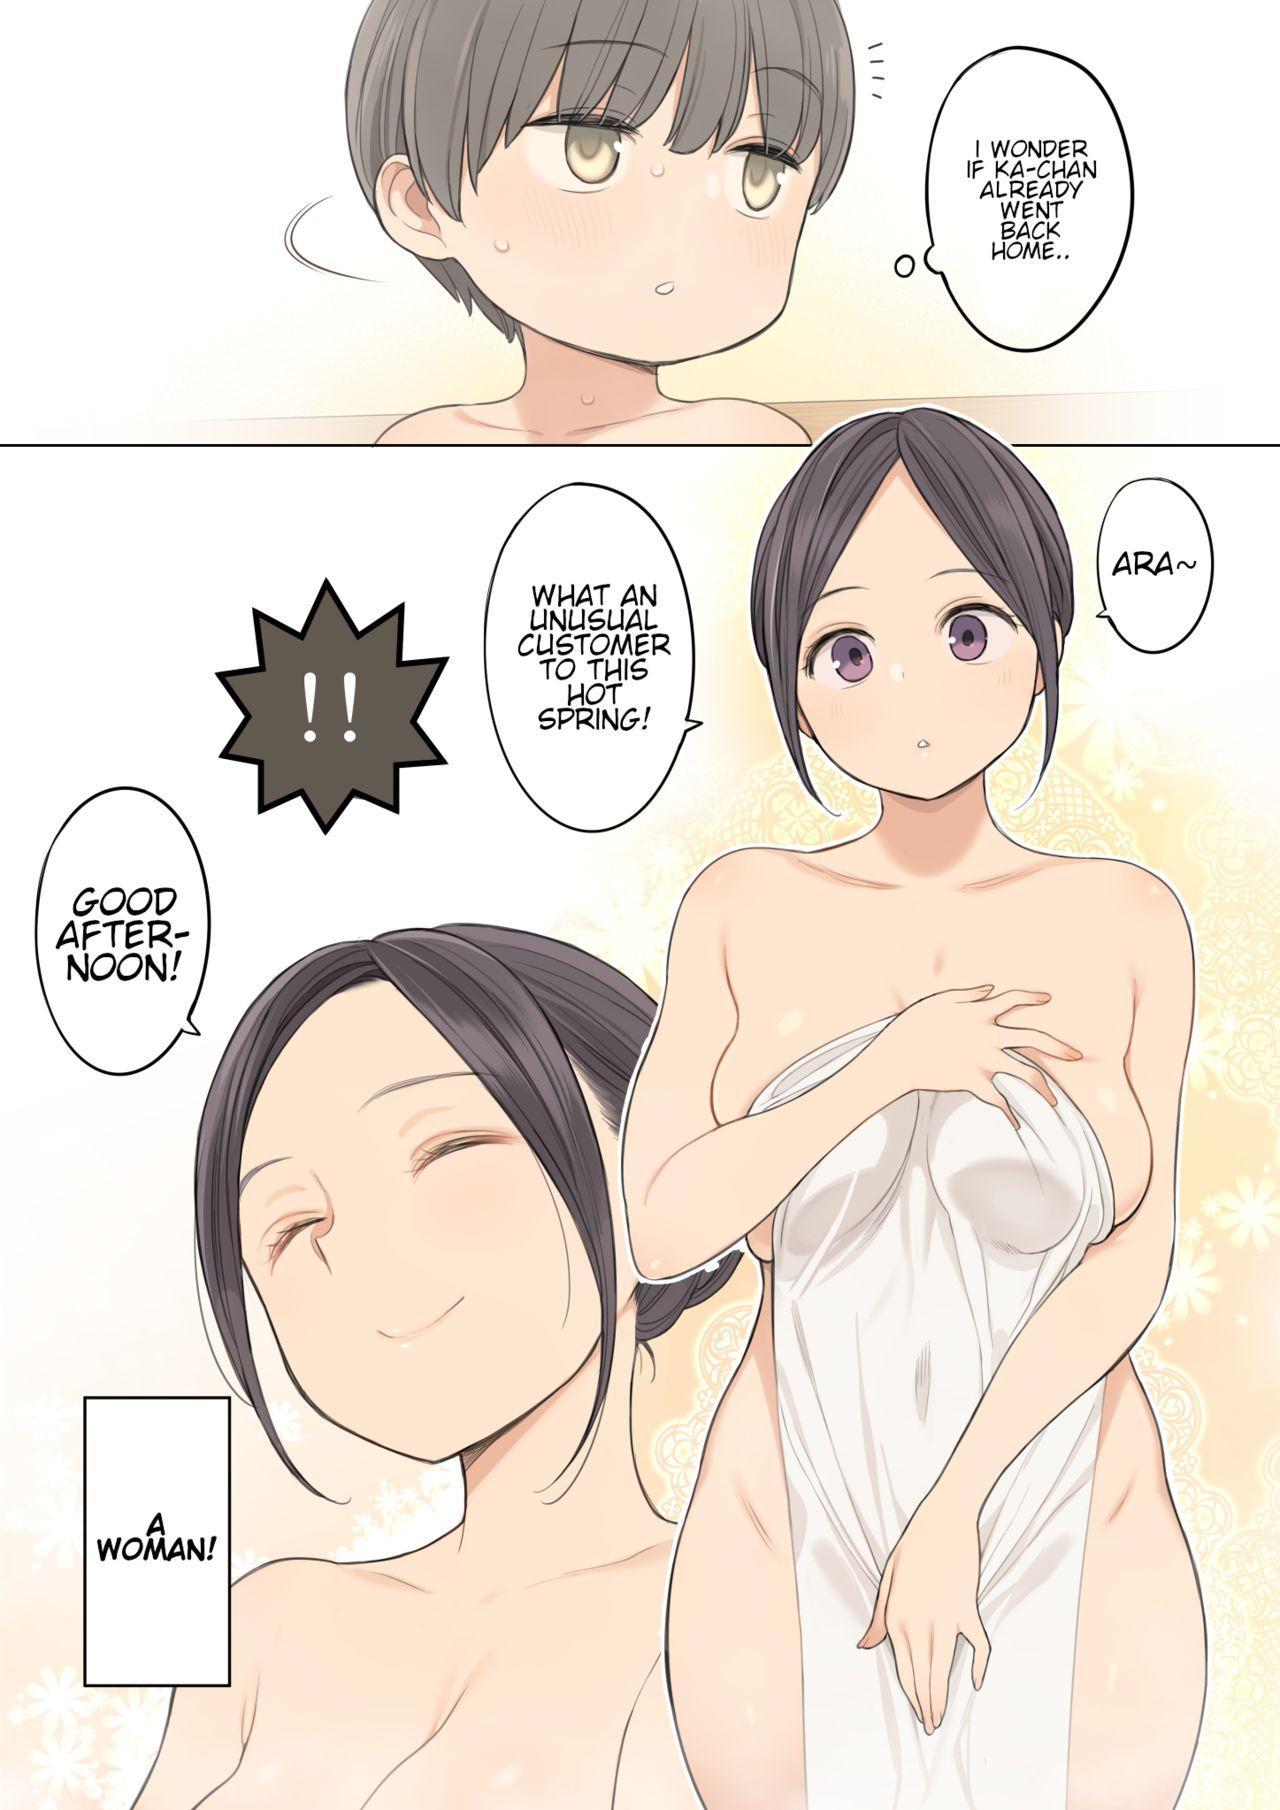 Konyoku Onsen de Toshiue no Onee-san ni Ippai Shasei Sasete Morau Hanashi | Story of how I came a lot with an older oneesan at the mixed hot spring bath 2